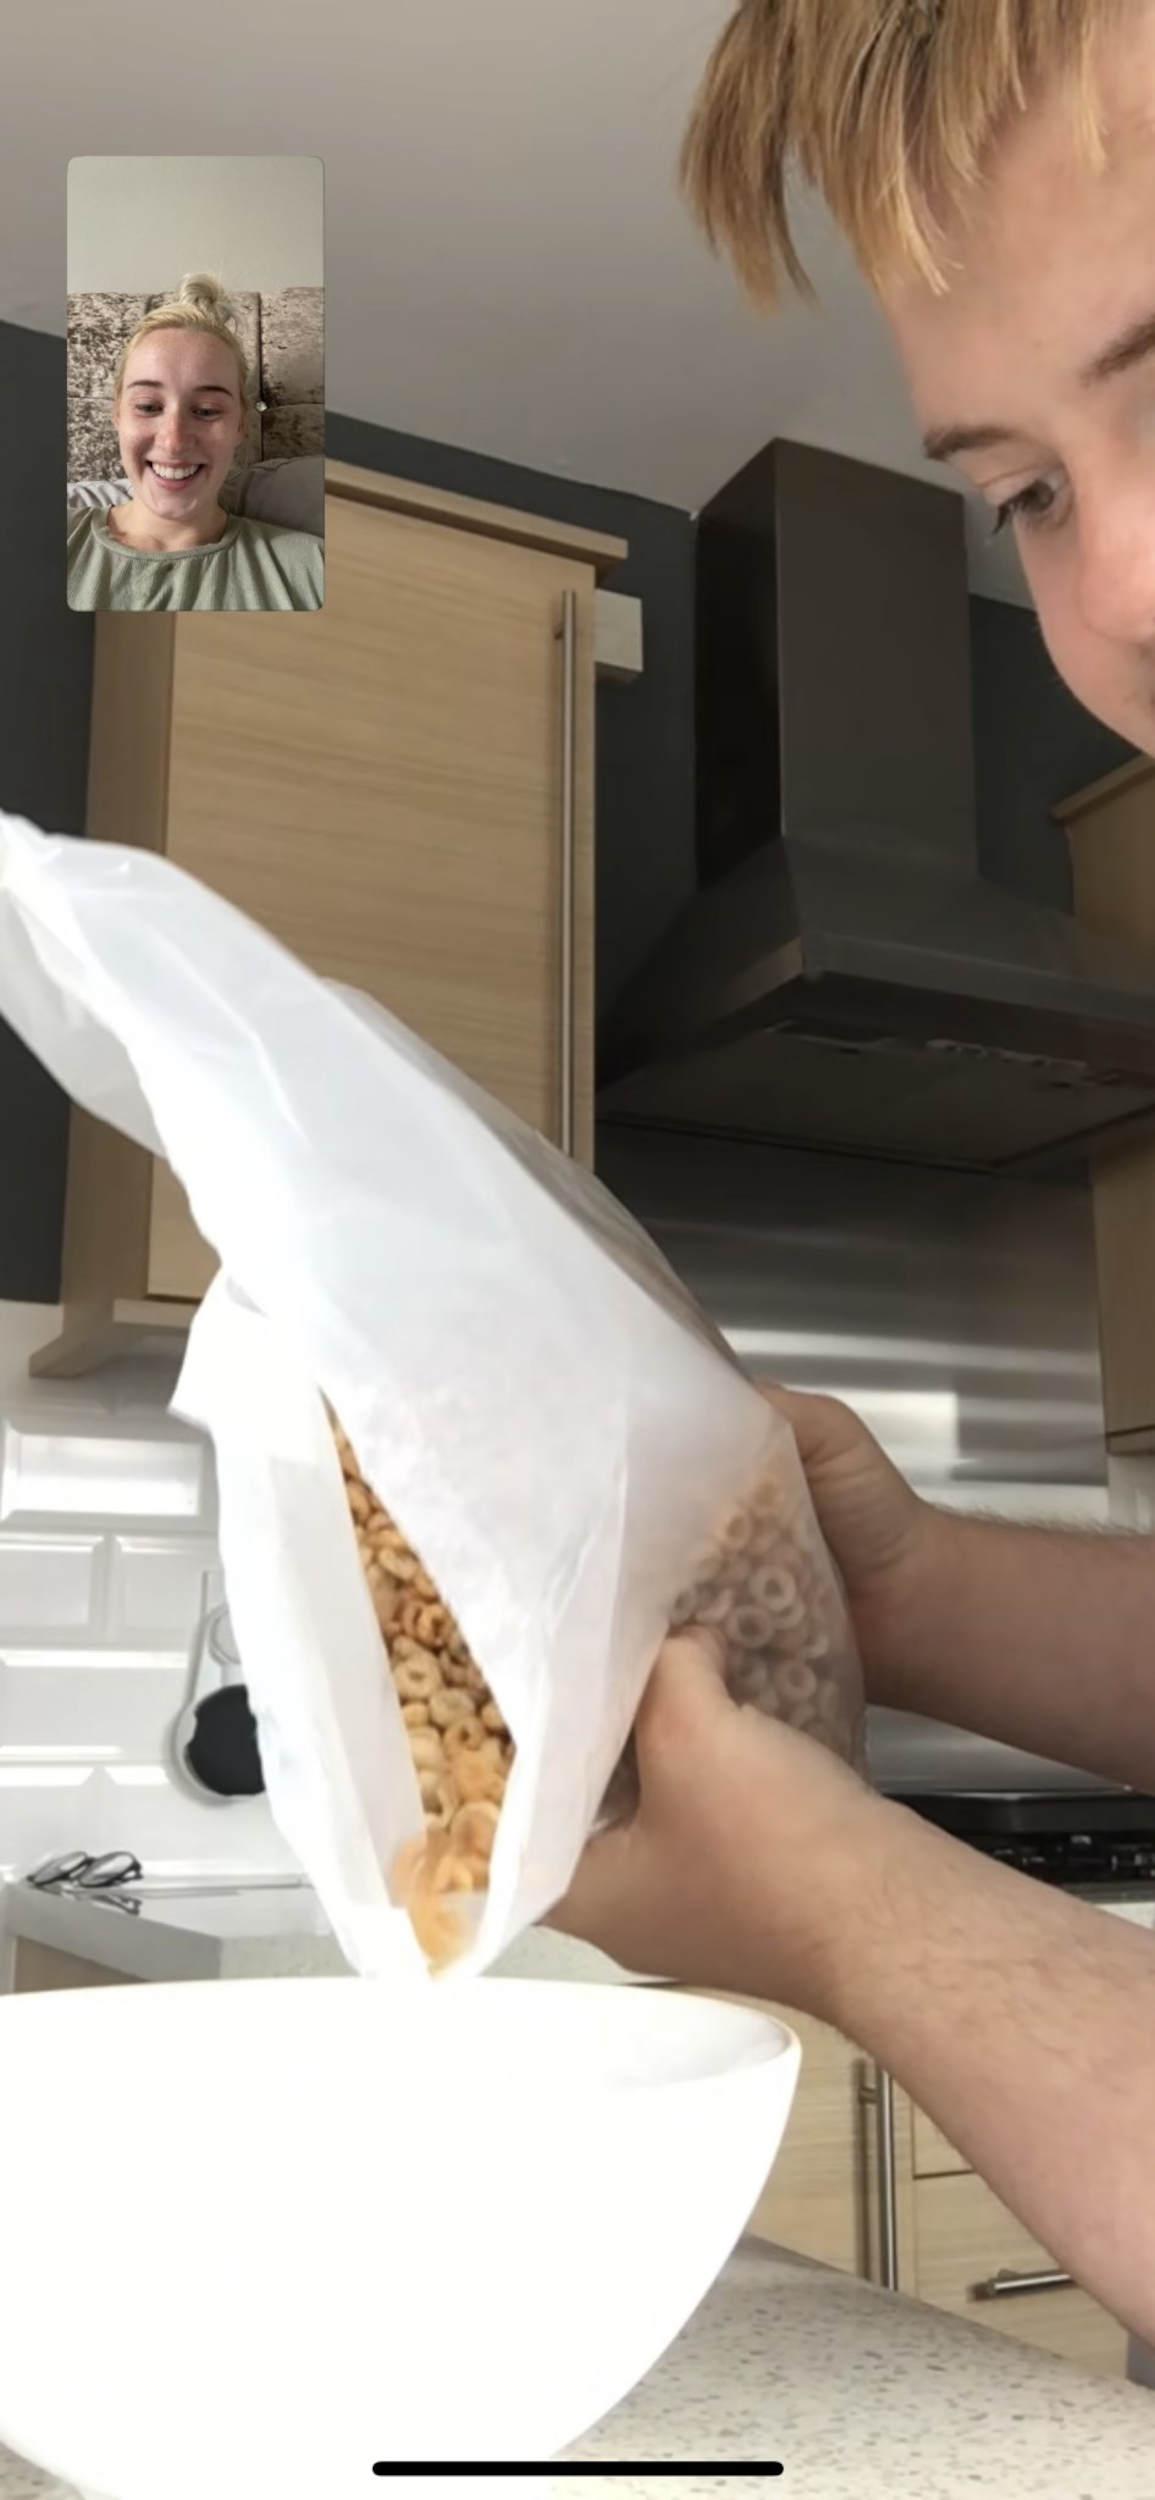 Michael McEwan carefully making his sister's cereal